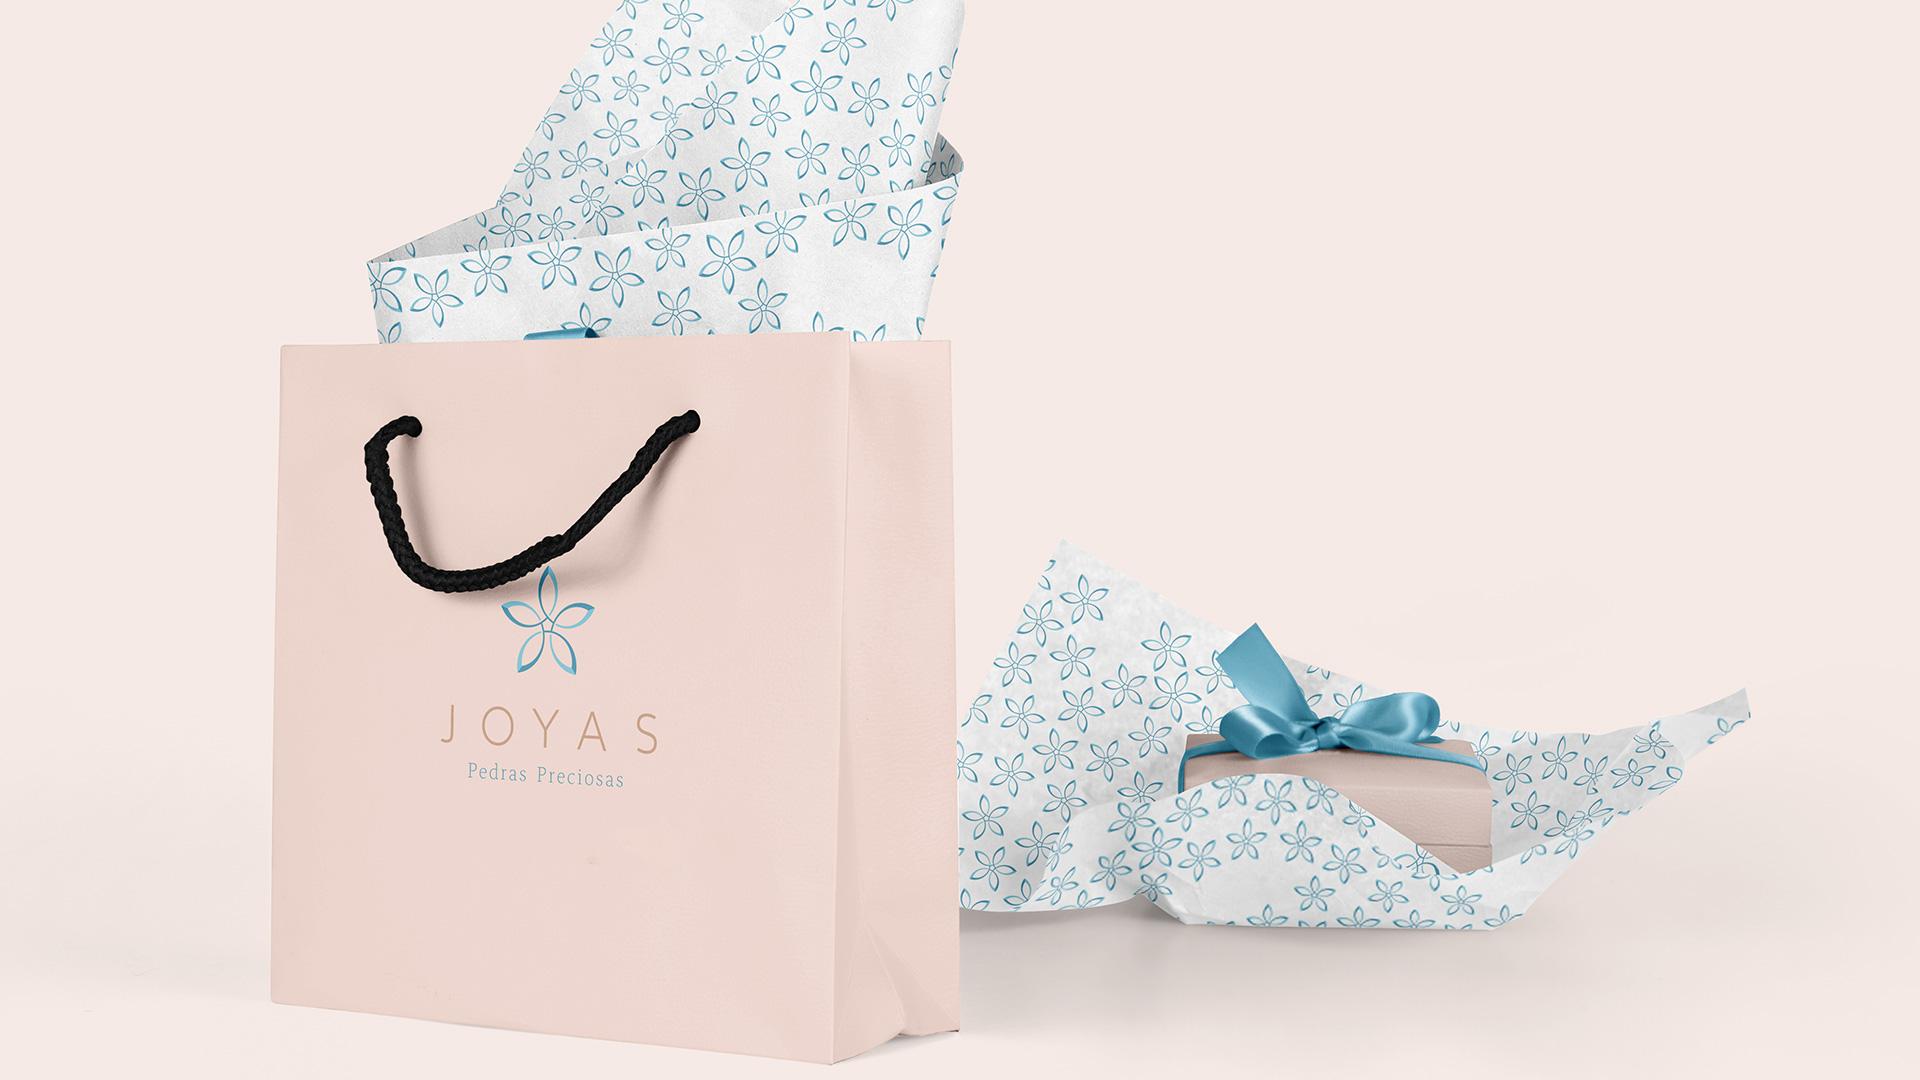 joyas-1-portfolio-fred-bueno-design